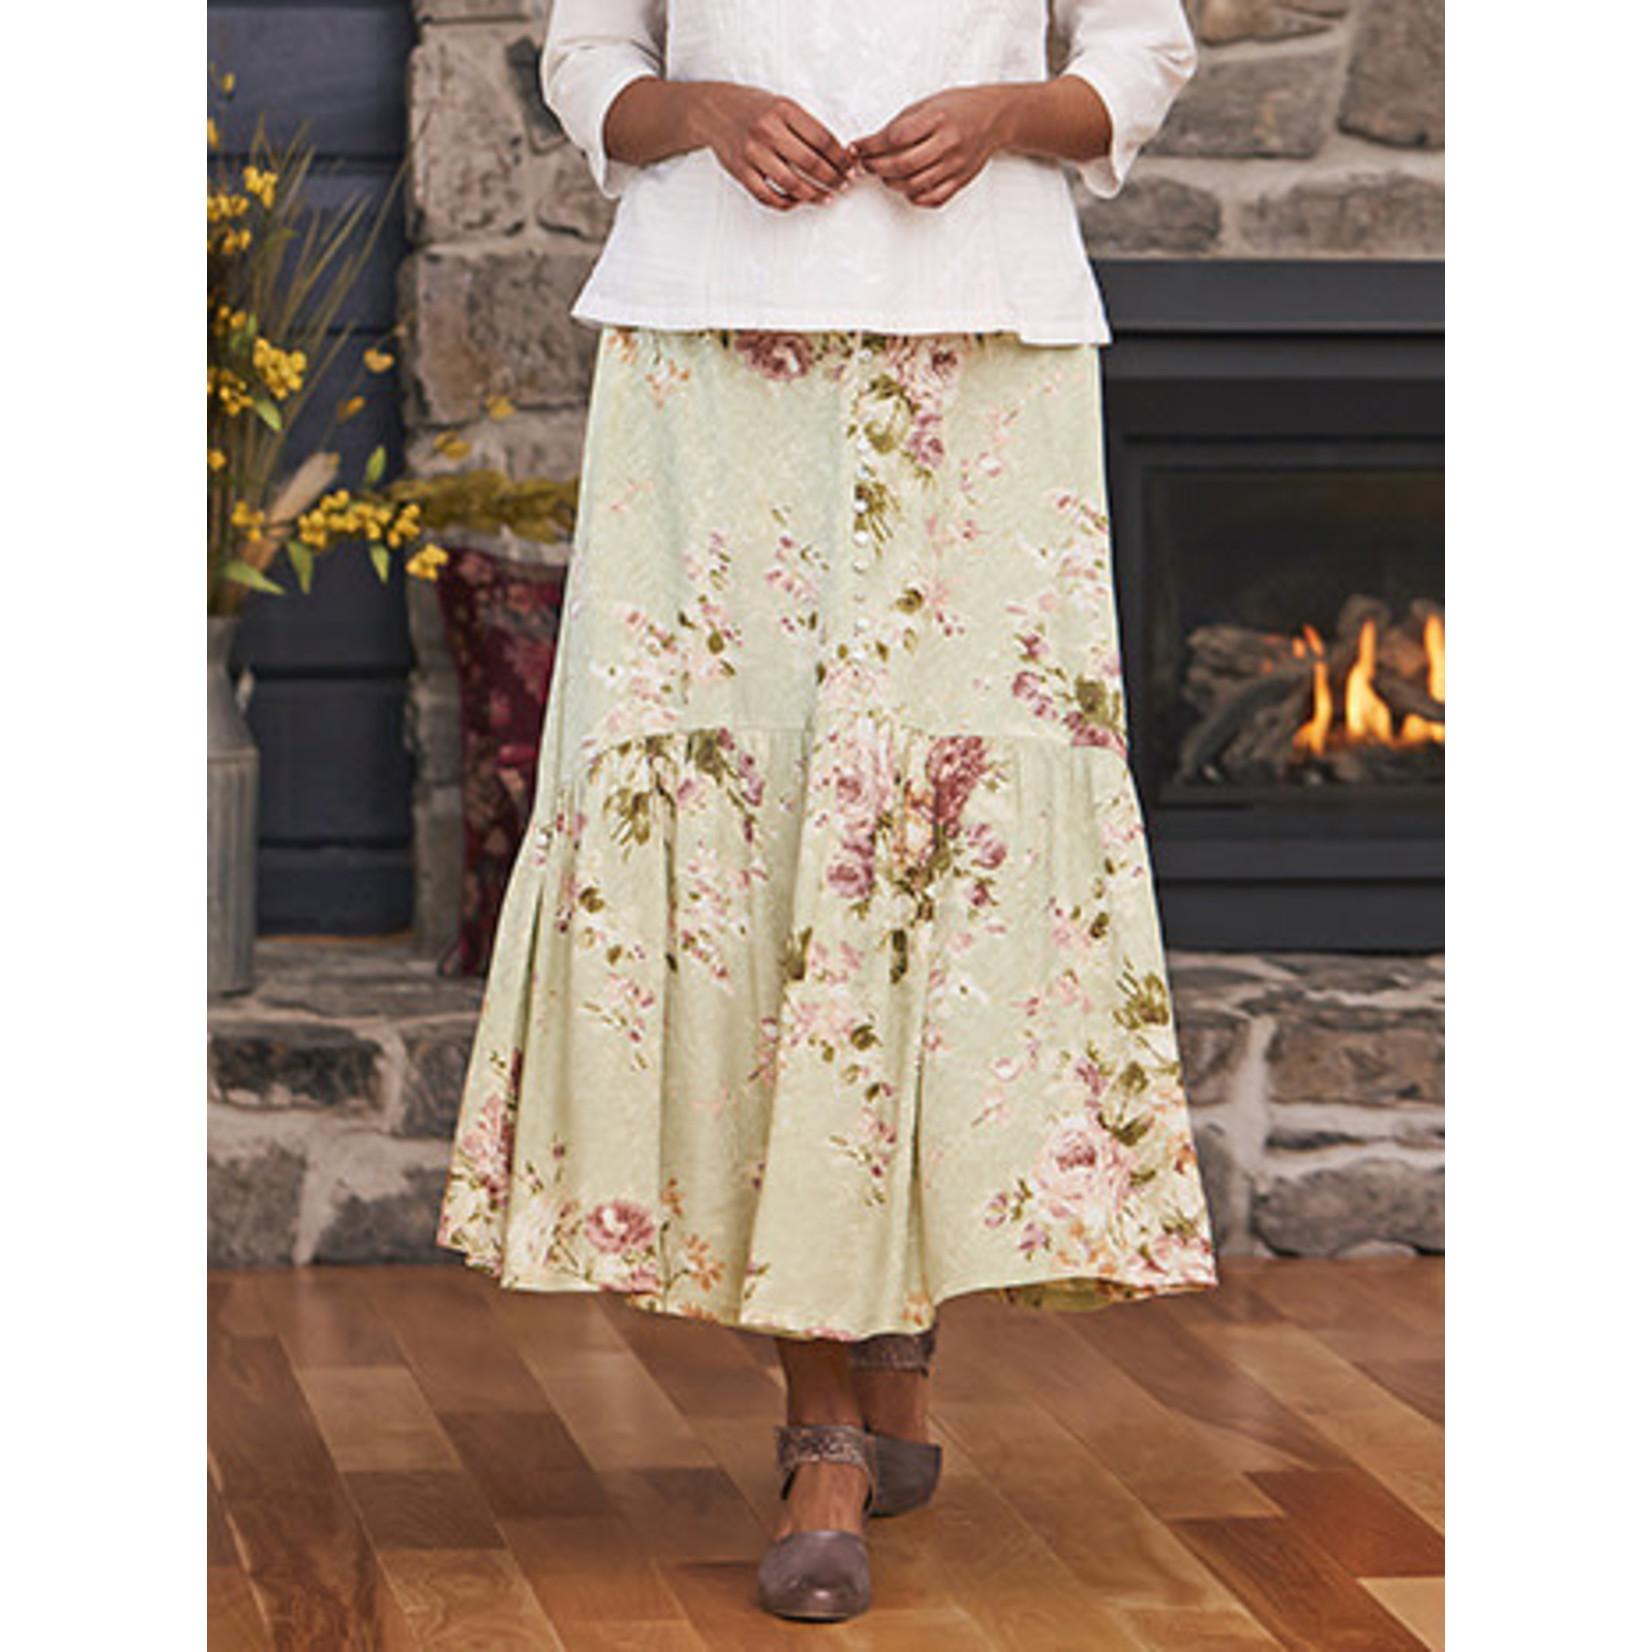 April Cornell Carolina Skirt